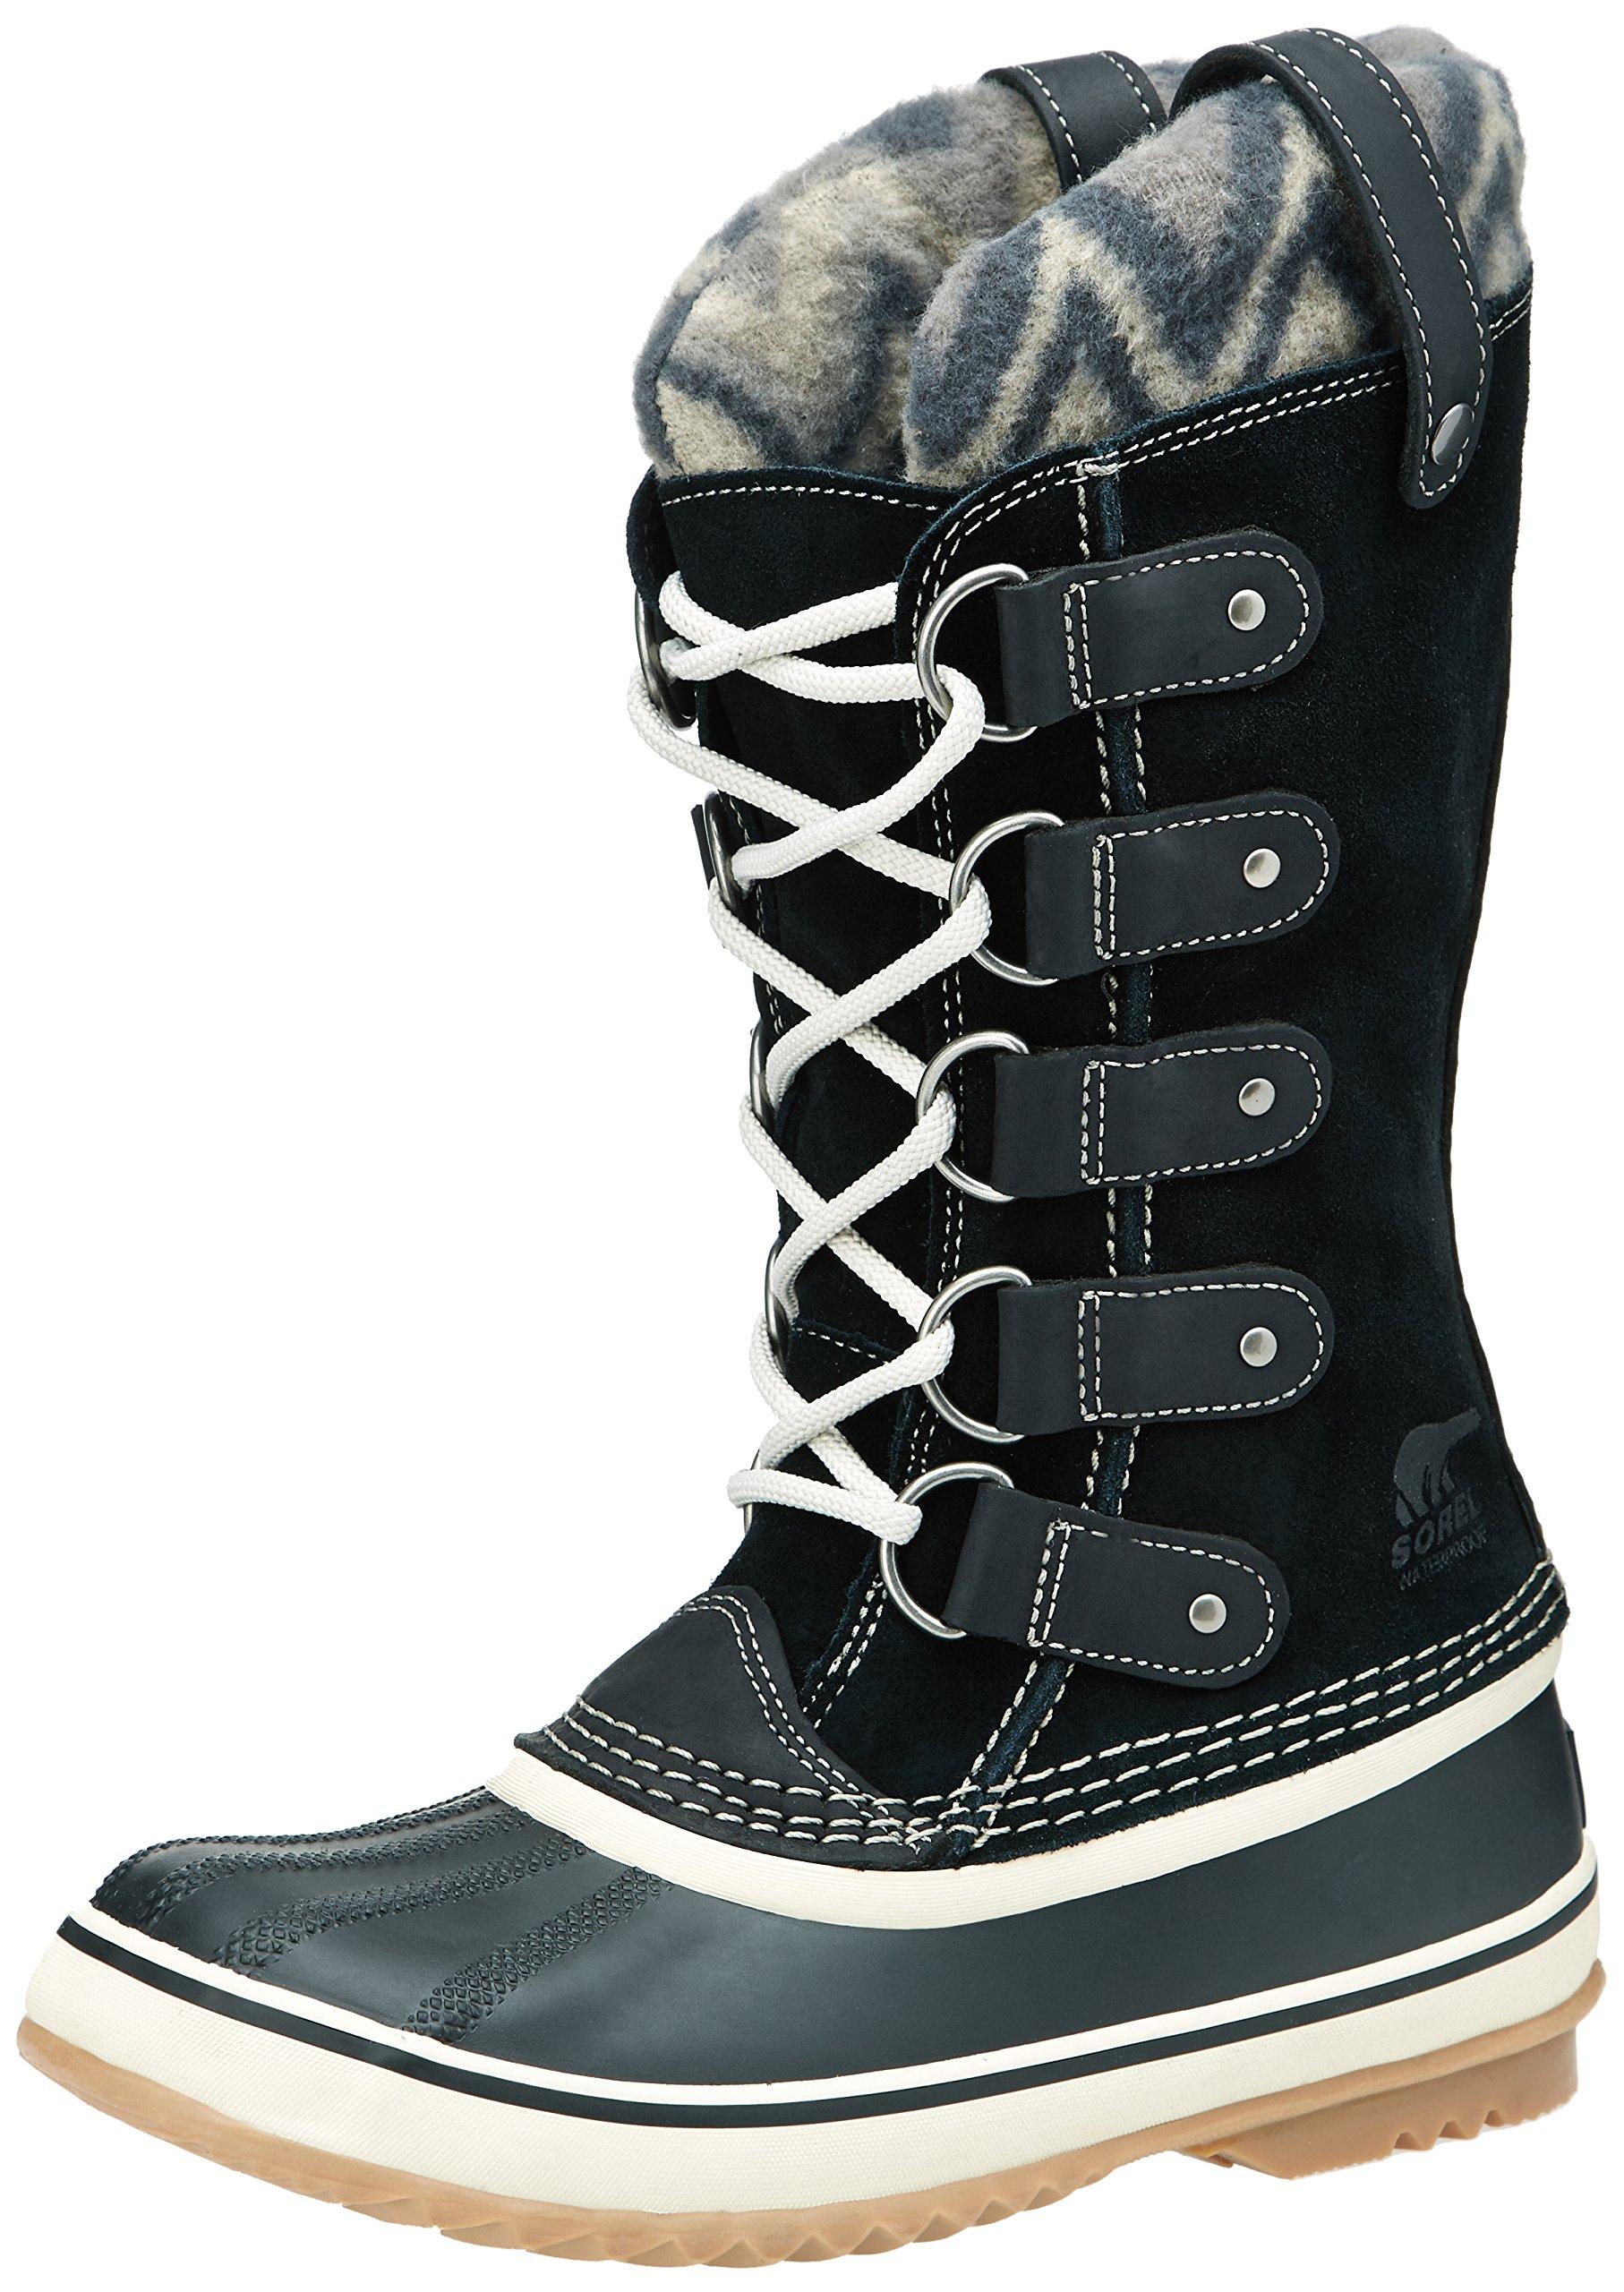 Sorel Joan Of Arctic Knit II Boot - Women's Black 6